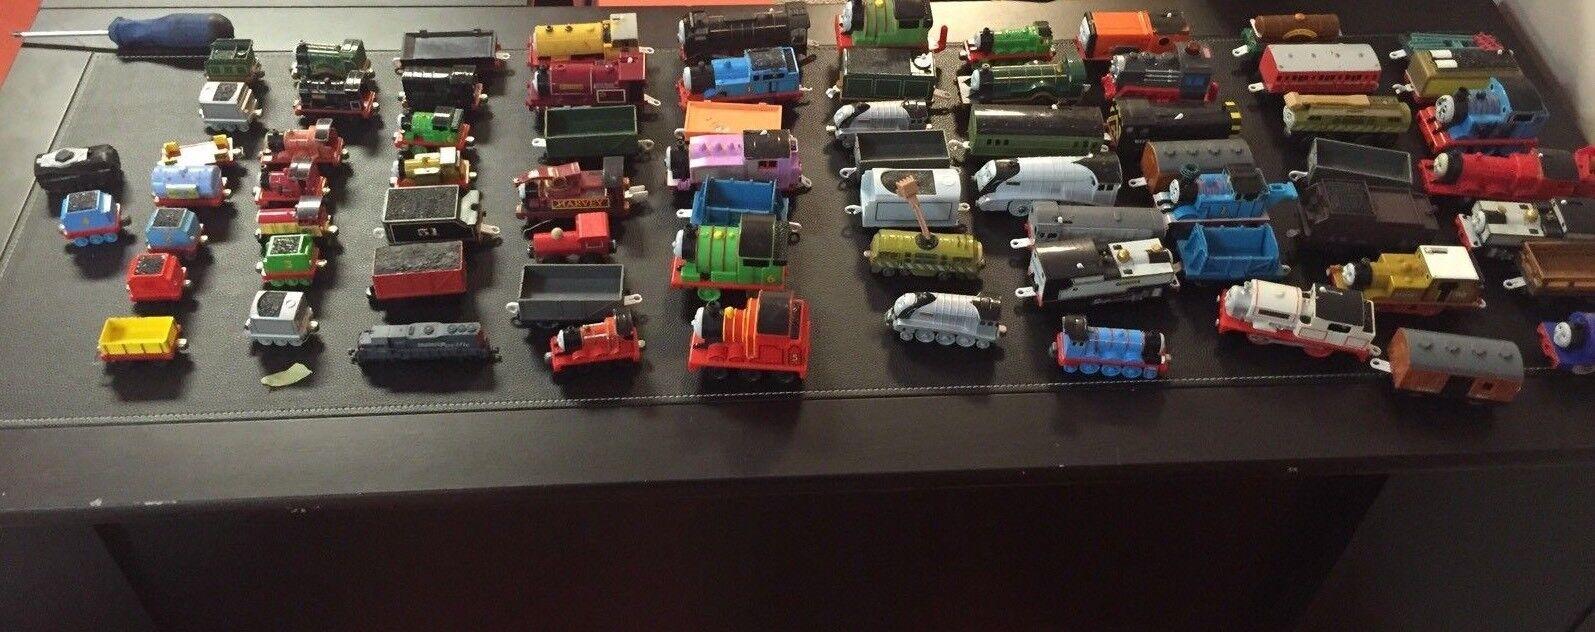 Enorme Thomas The Train Cars lotes de 71 piezas